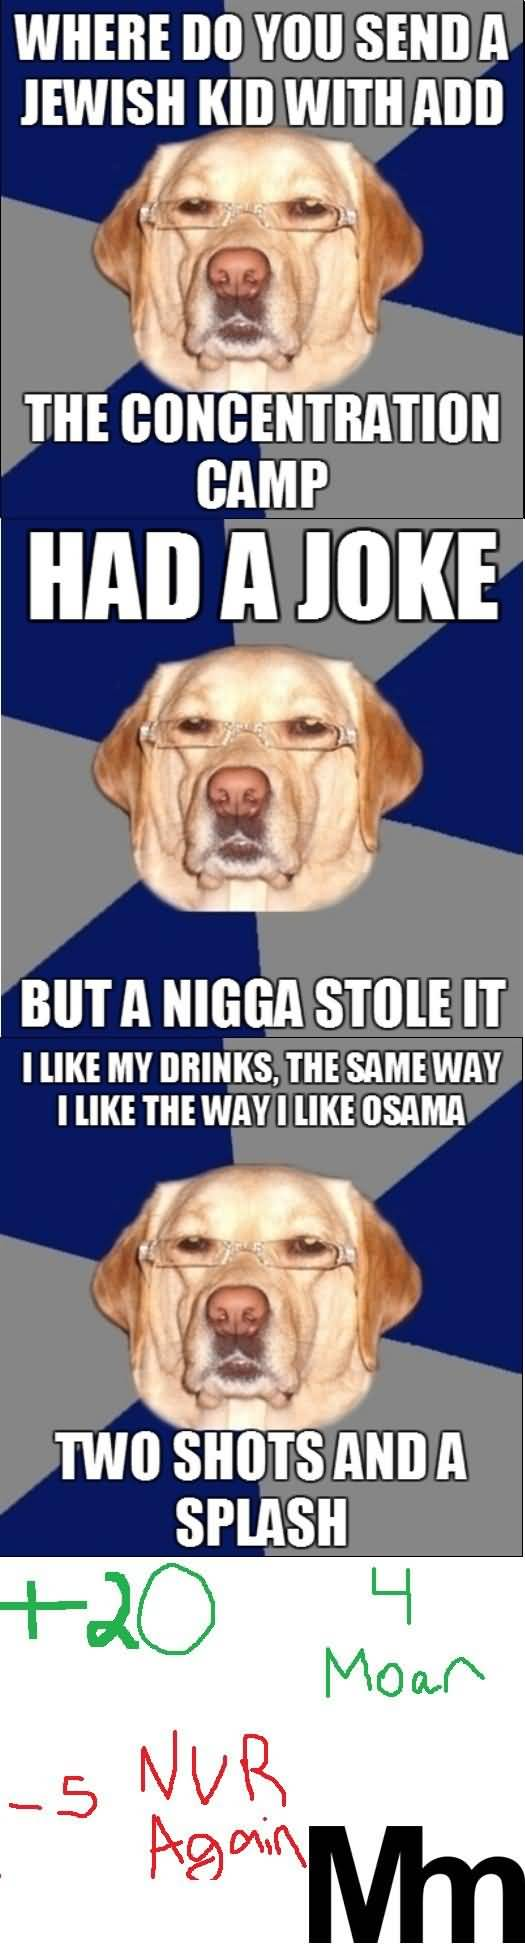 Racist Dog Meme Funny Image Photo Joke 14